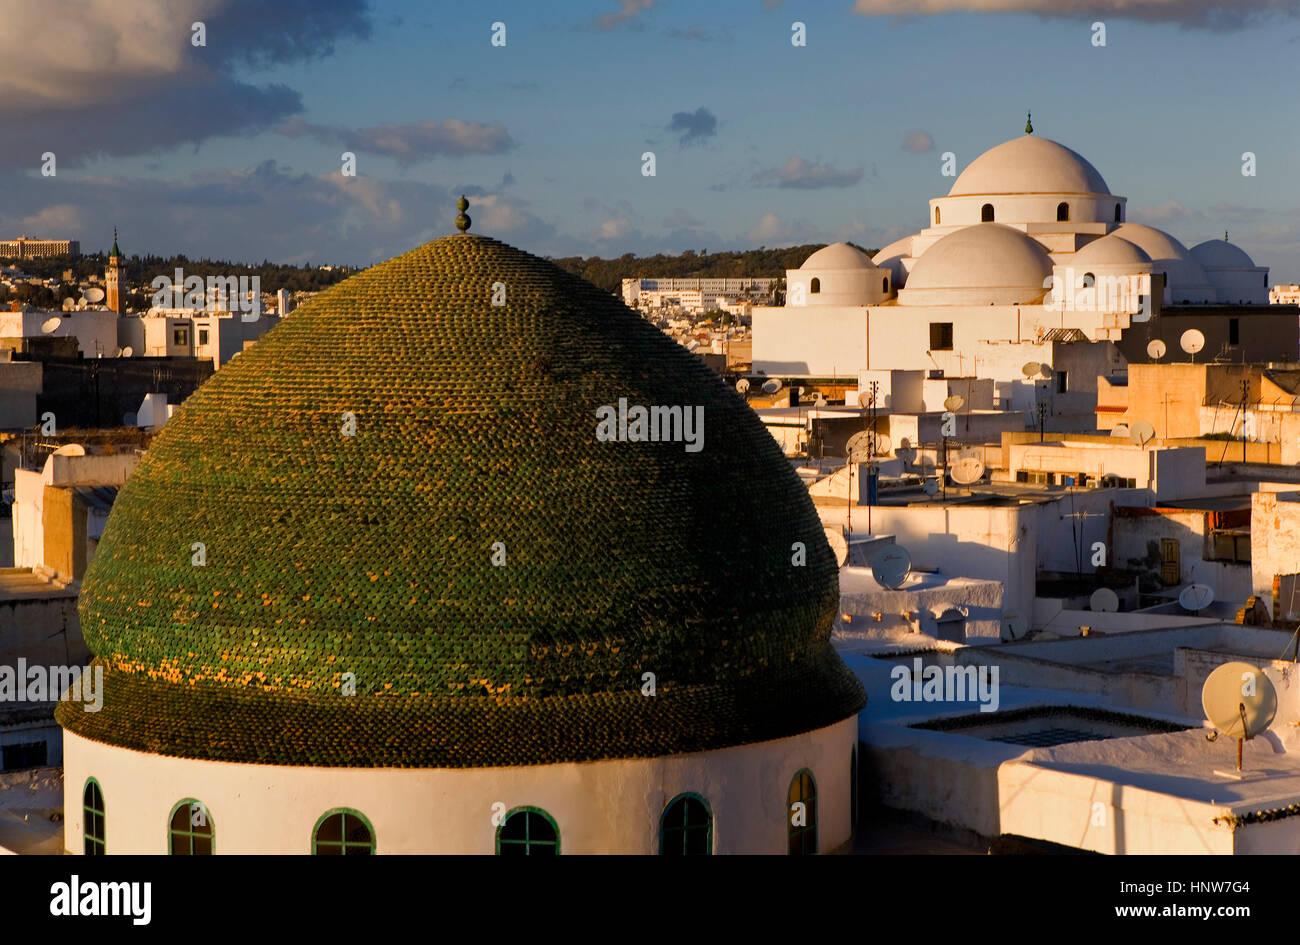 Tunisia: City of Tunis.skyline of Tunis. At right Sidi Mahrez Mosque. At left Dome of Zaouia de Sidi Brahim - Stock Image